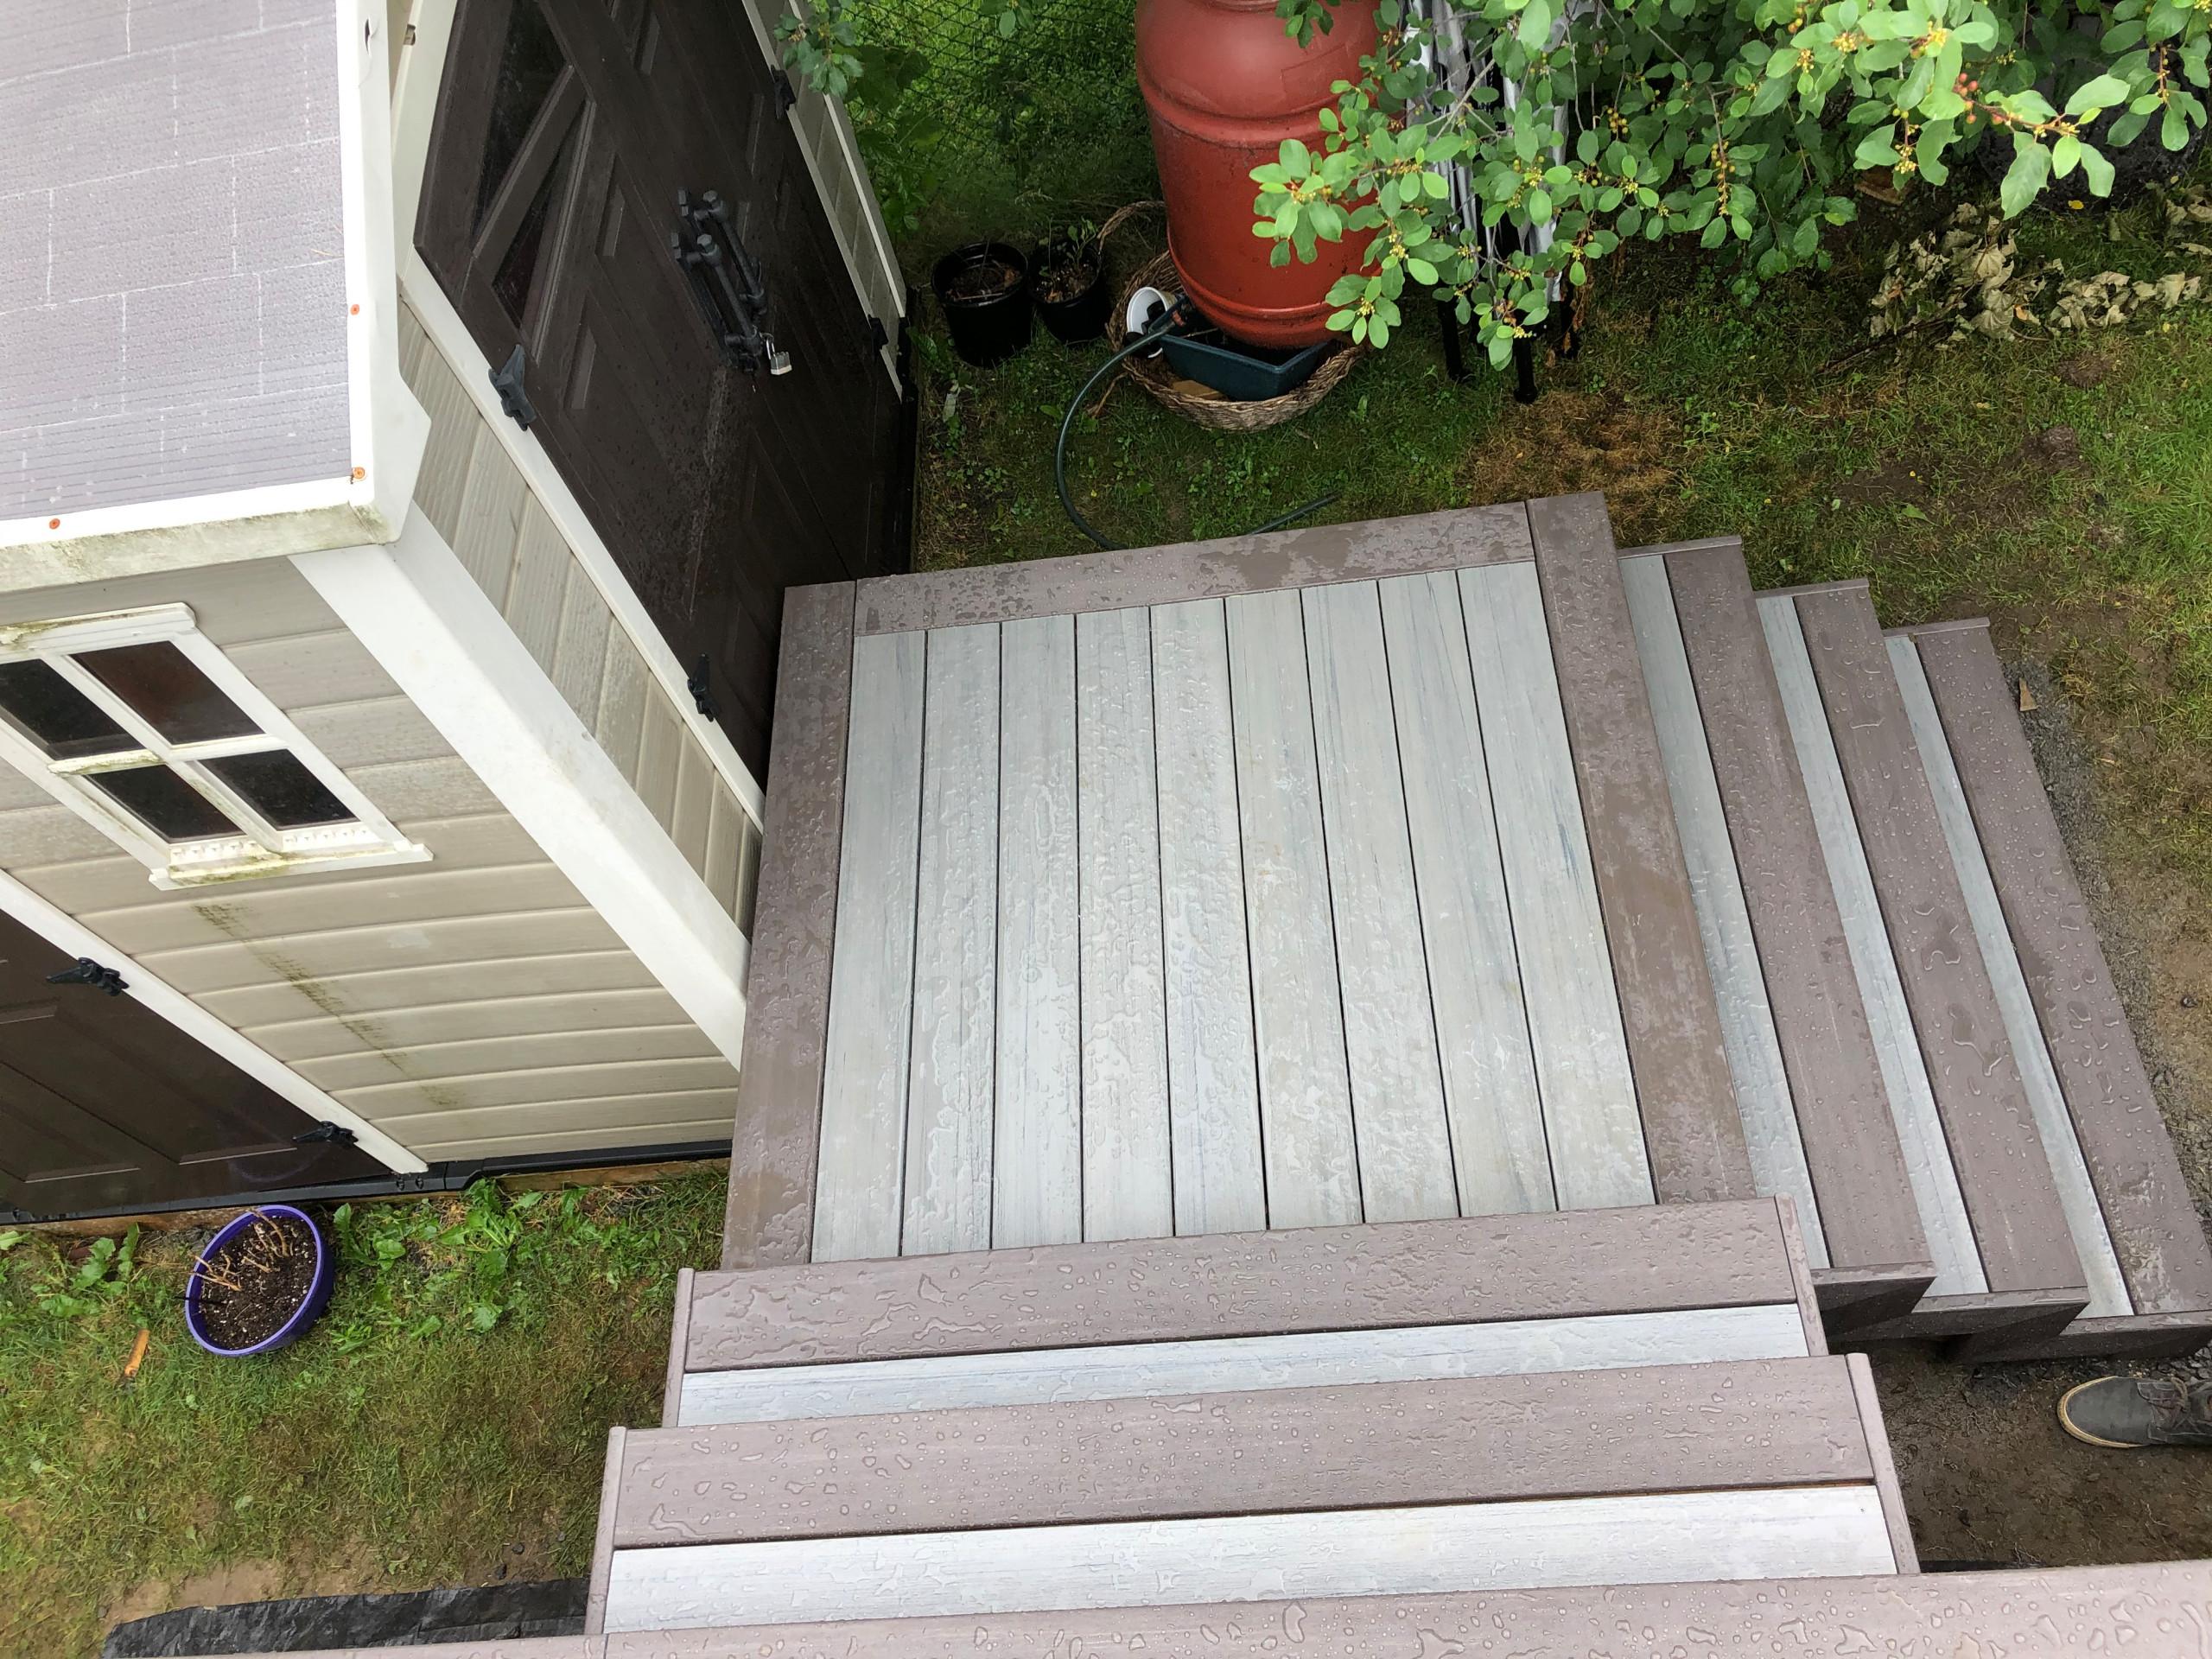 Timbertech composite deck around a pool